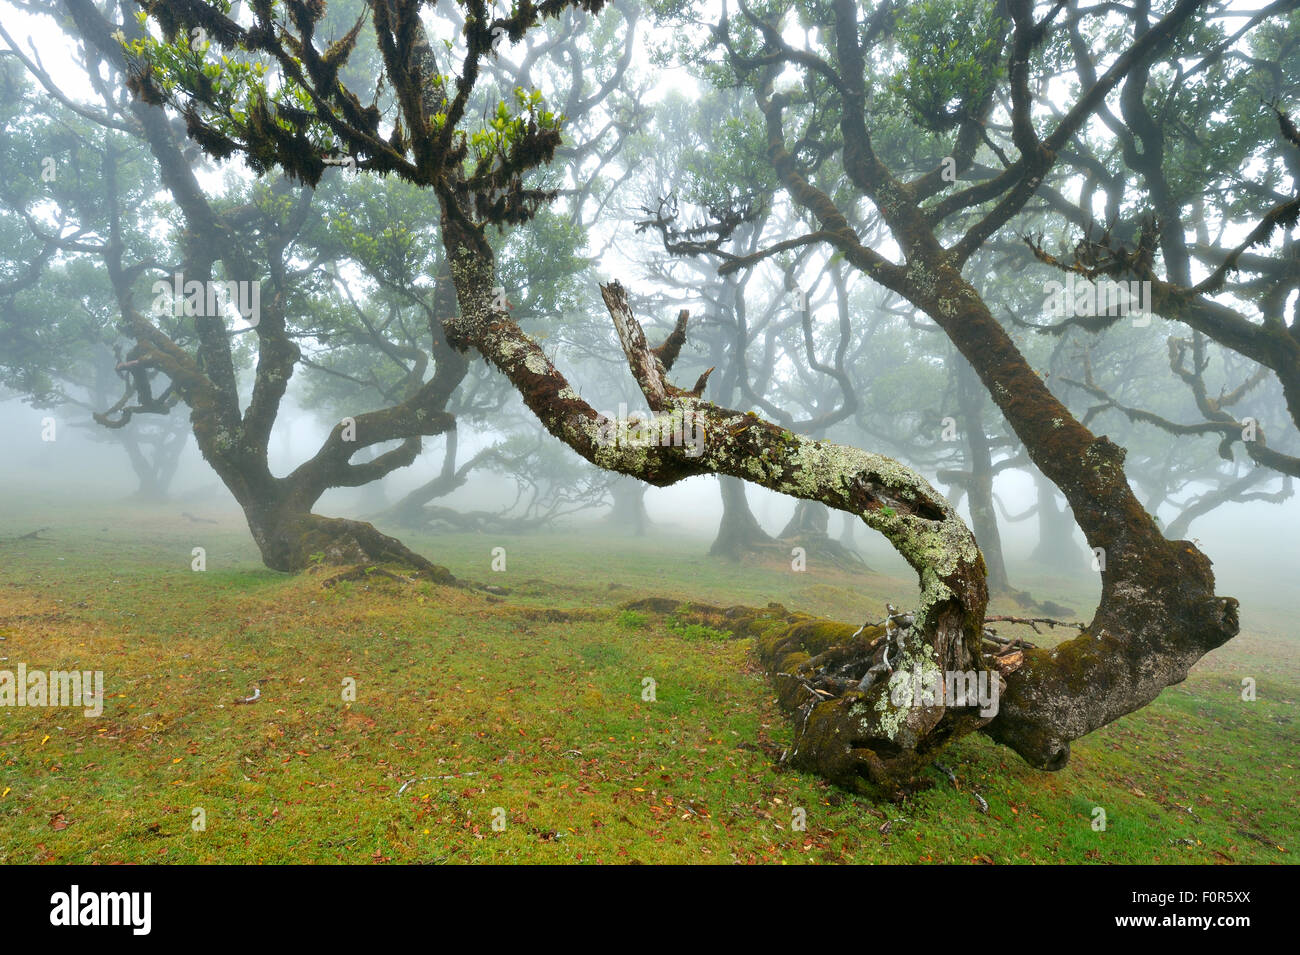 Old laurel forest or Laurissilva Forest, stinkwood (Ocotea foetens) trees in fog, UNESCO World Heritage Site, Fanal, - Stock Image